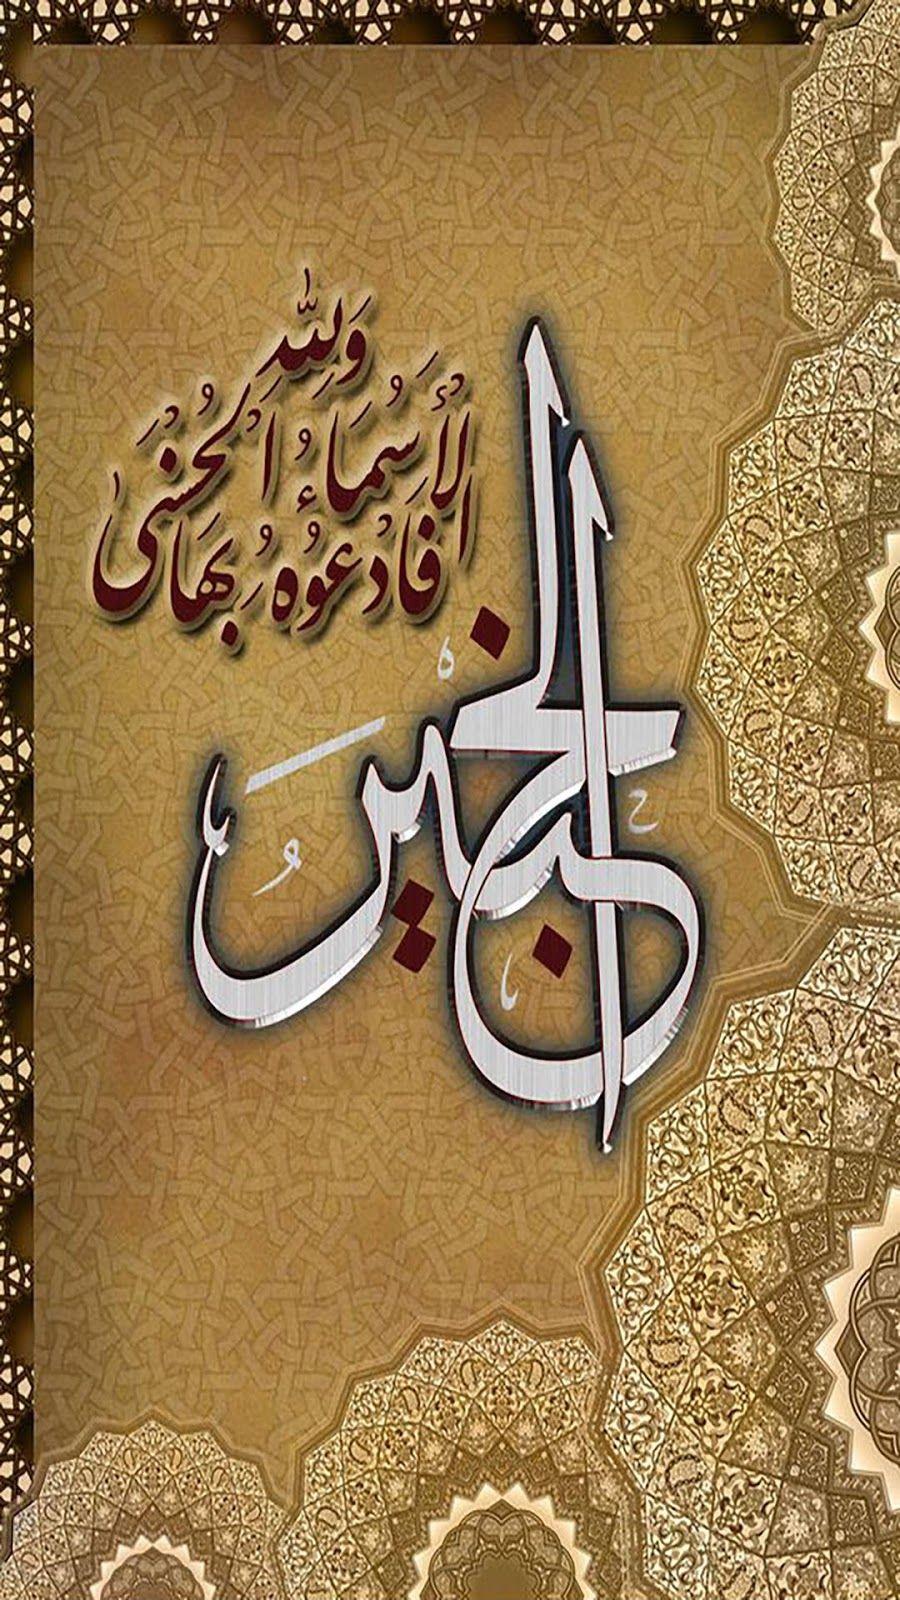 Kaligrafi Kaligrafi, Kaligrafi arab